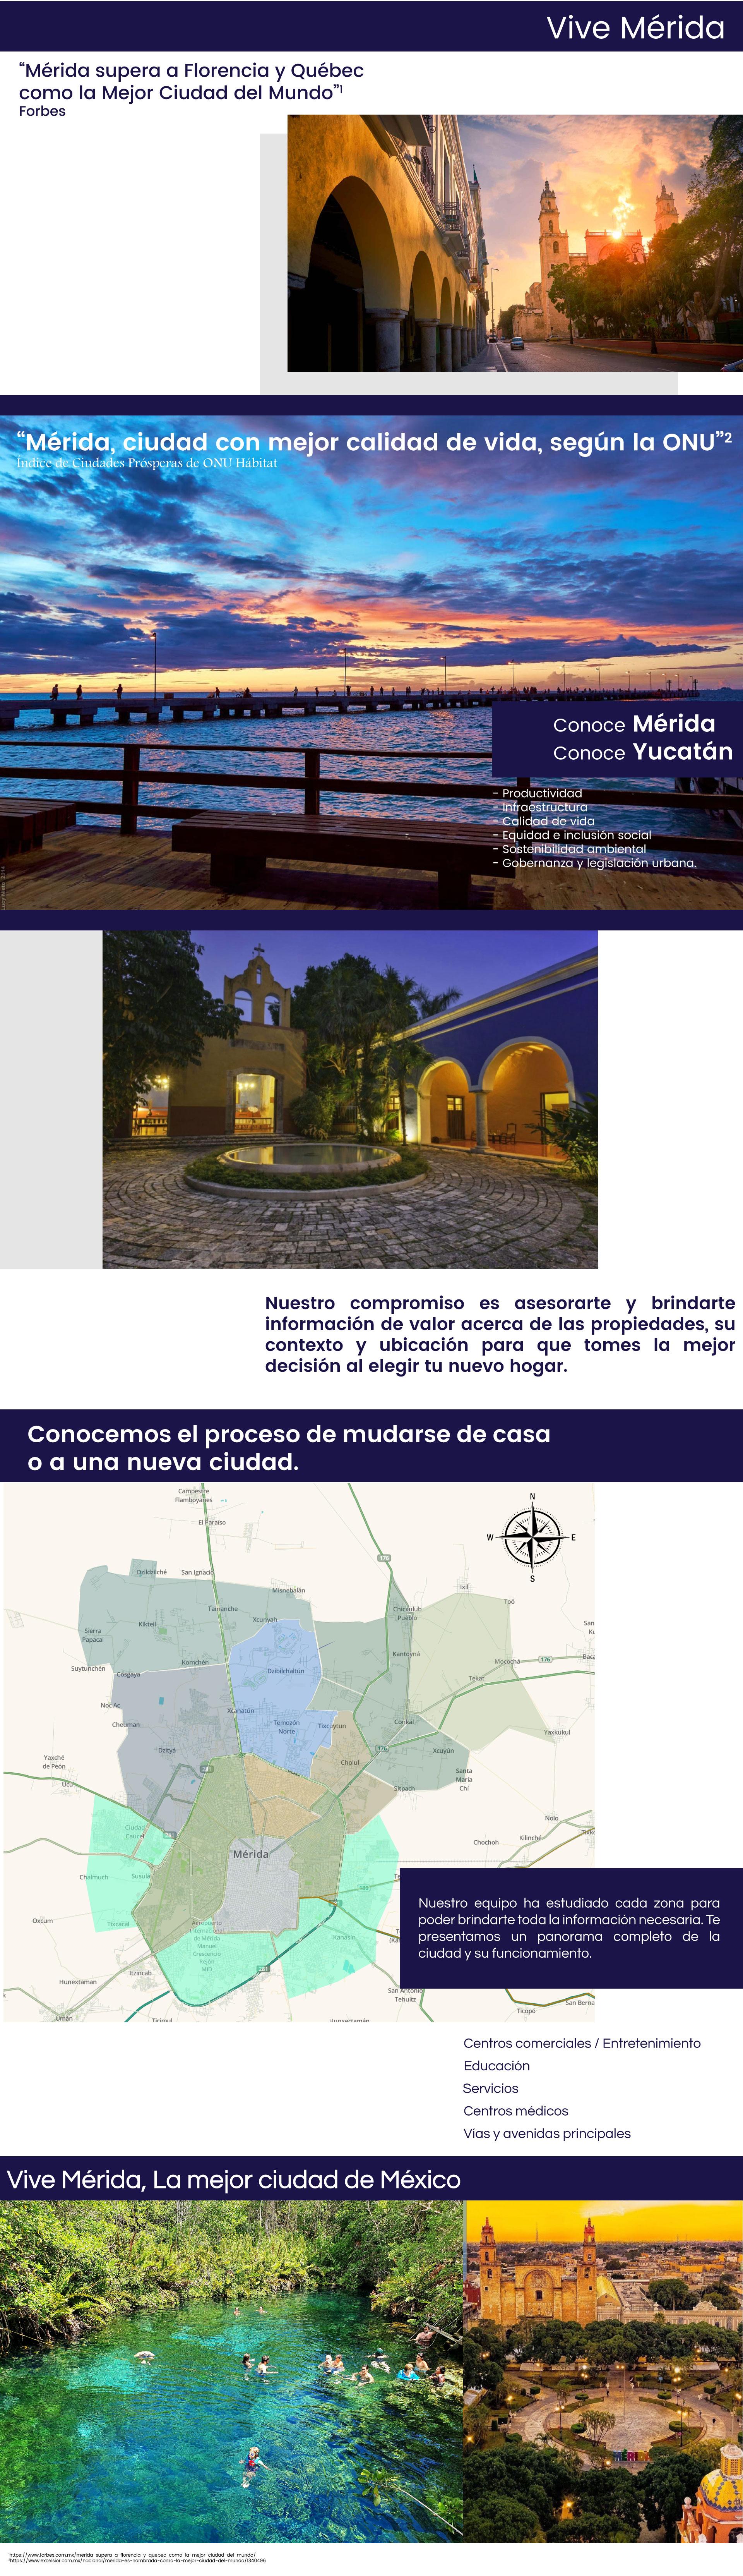 CONOCE-MÉRIDA.jpg